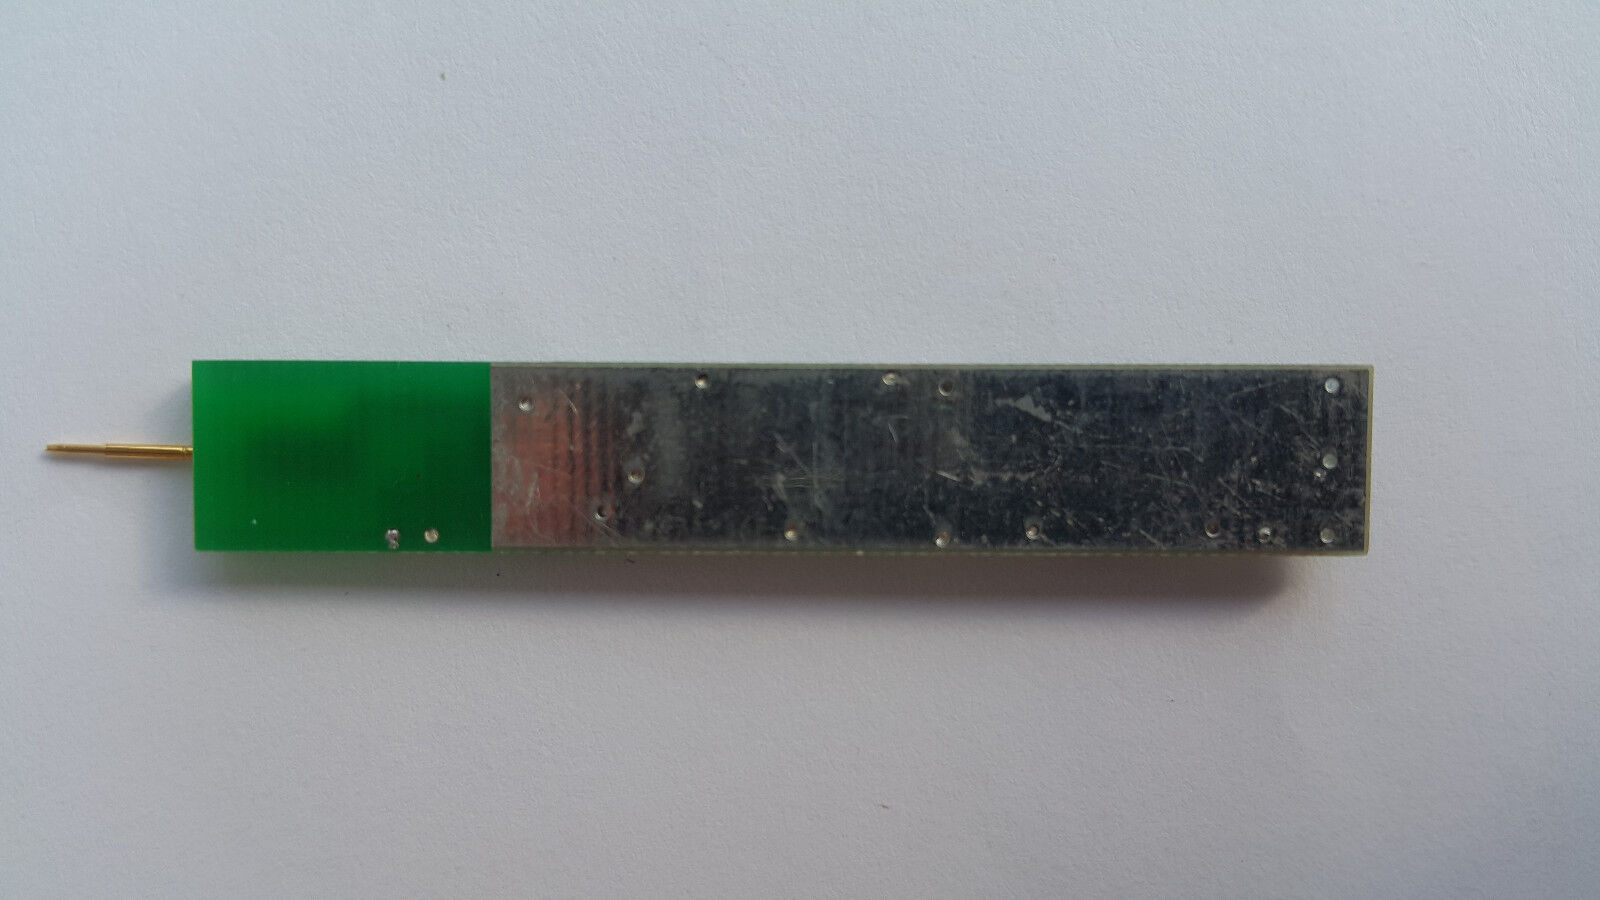 RF Active Probe 0 1 - 500 MHz with AD8307 detecto